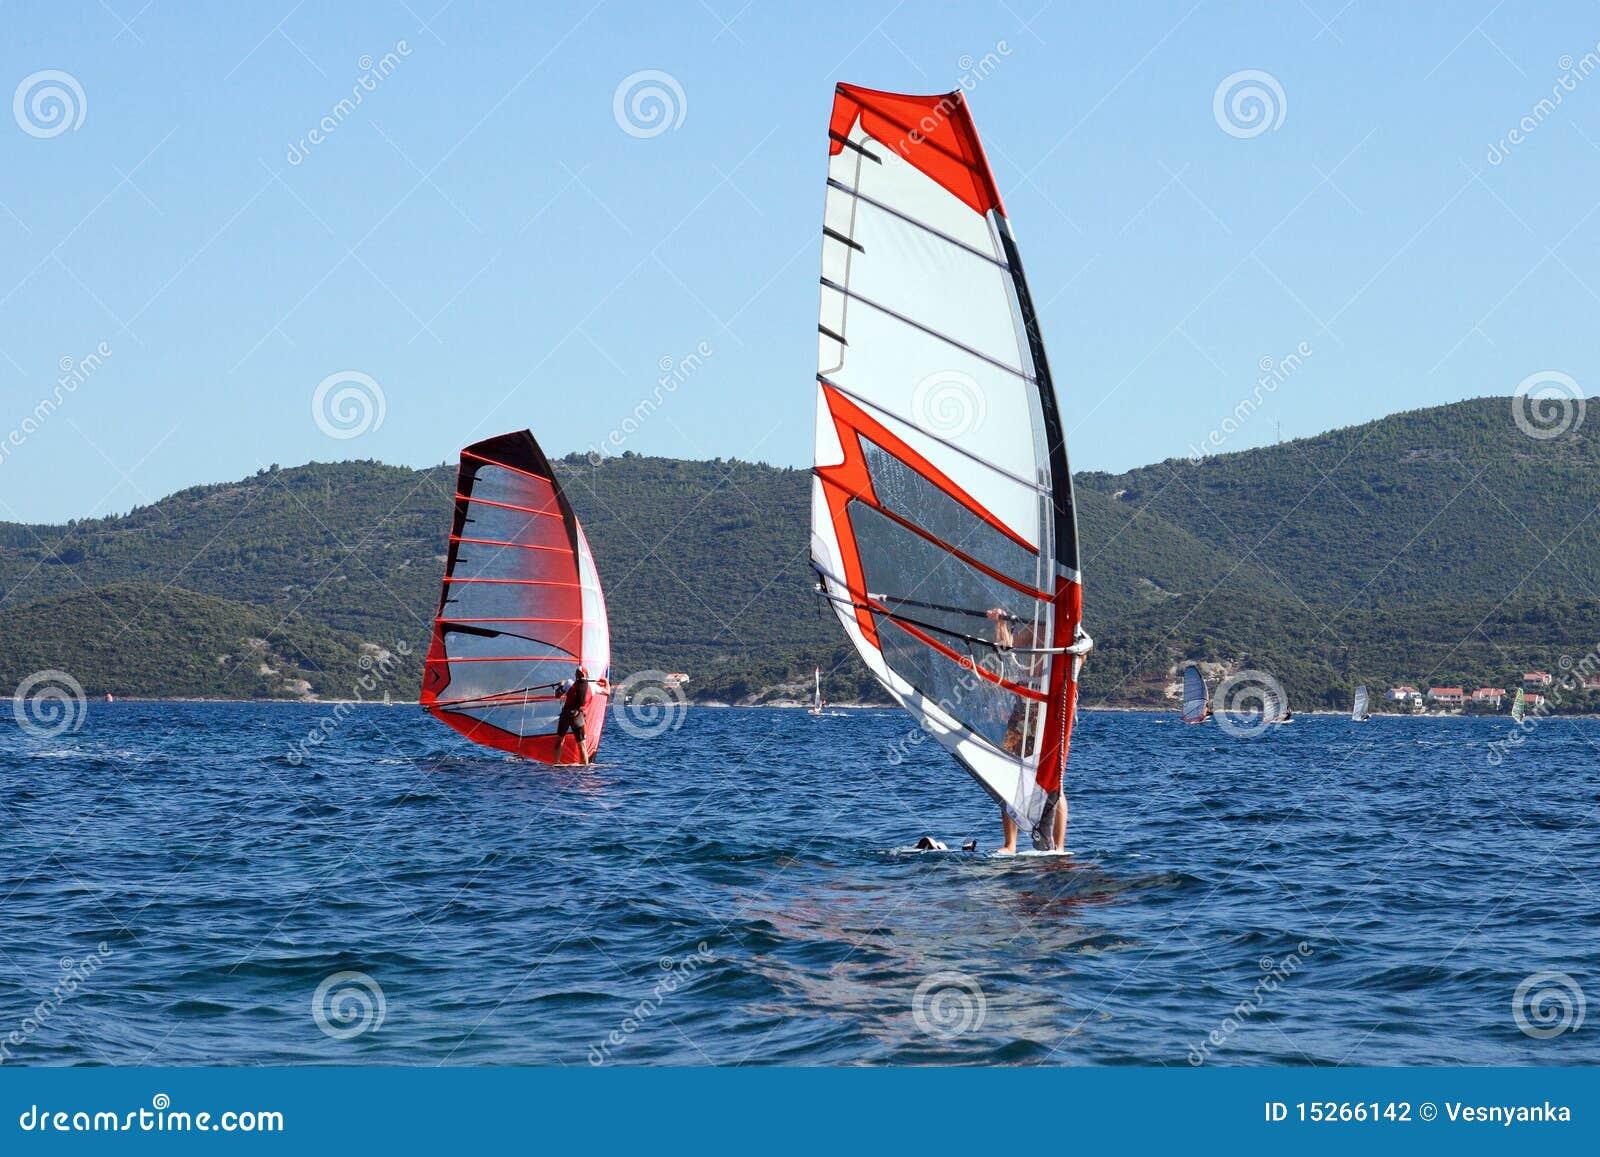 ... , Die In Das Adriatische Meer Surfen Stockfotografie - Bild: 15266142